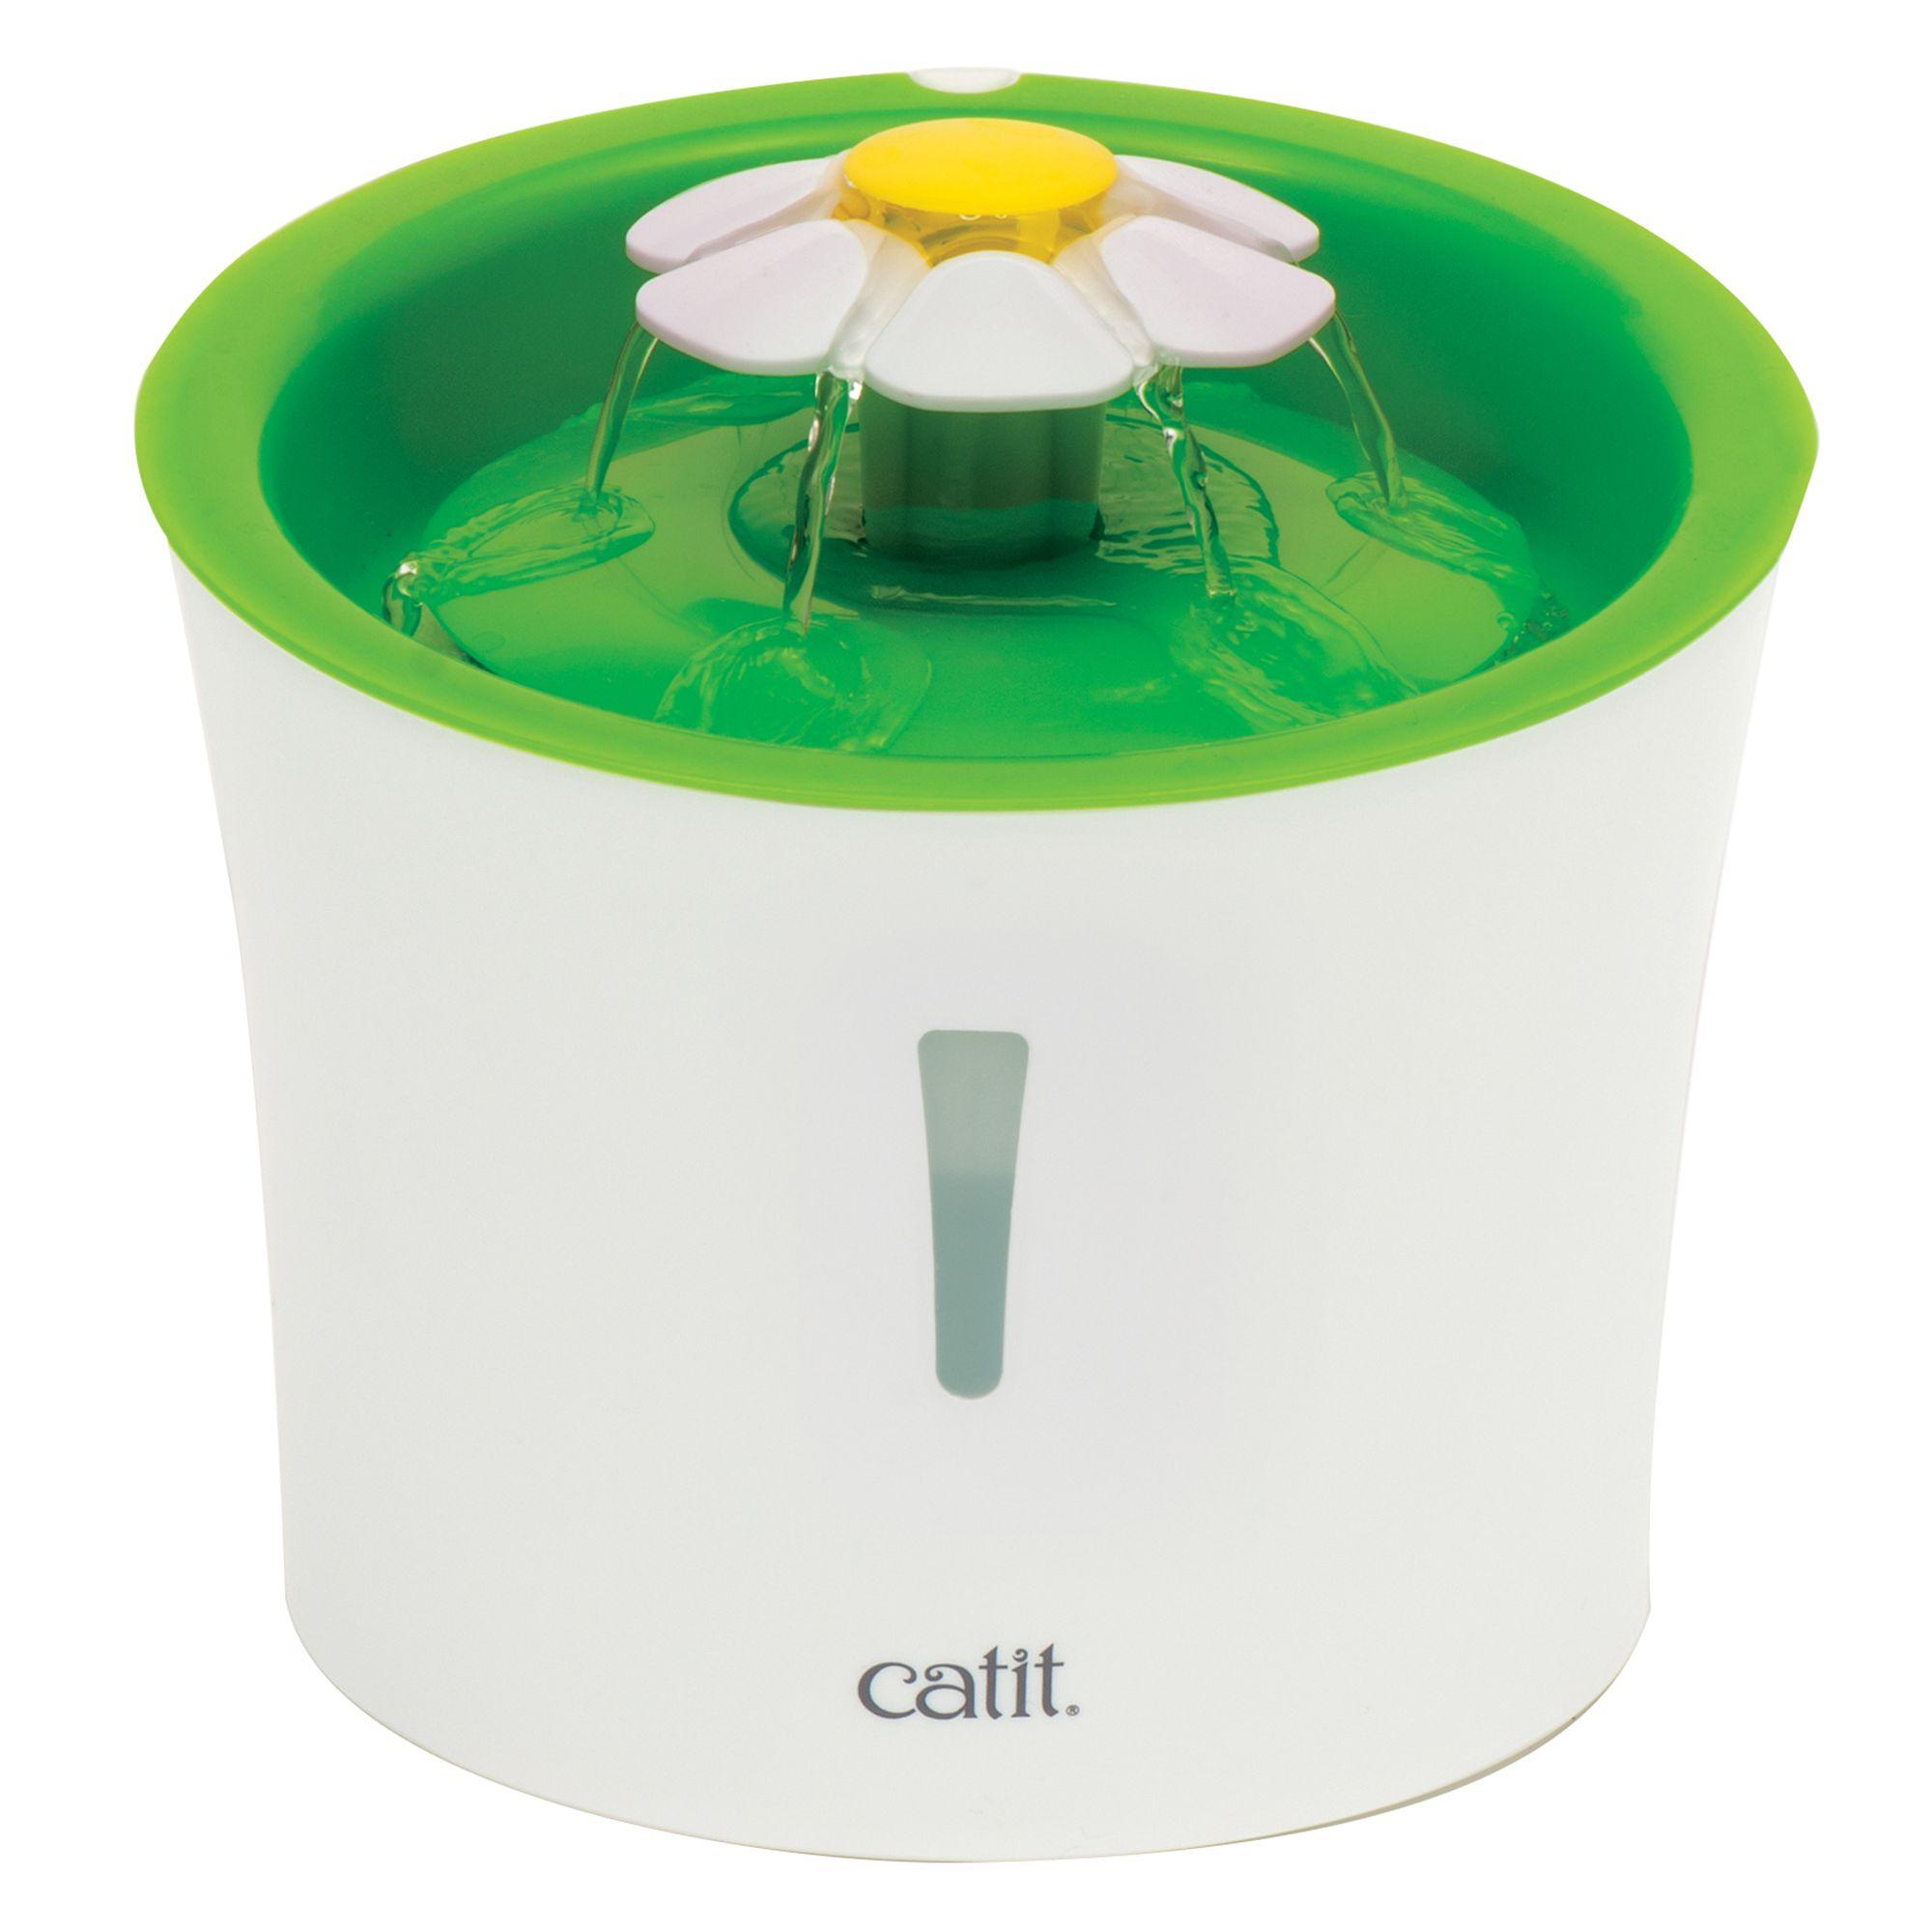 Catit® 2.0 Flower Cat Drinking Fountain